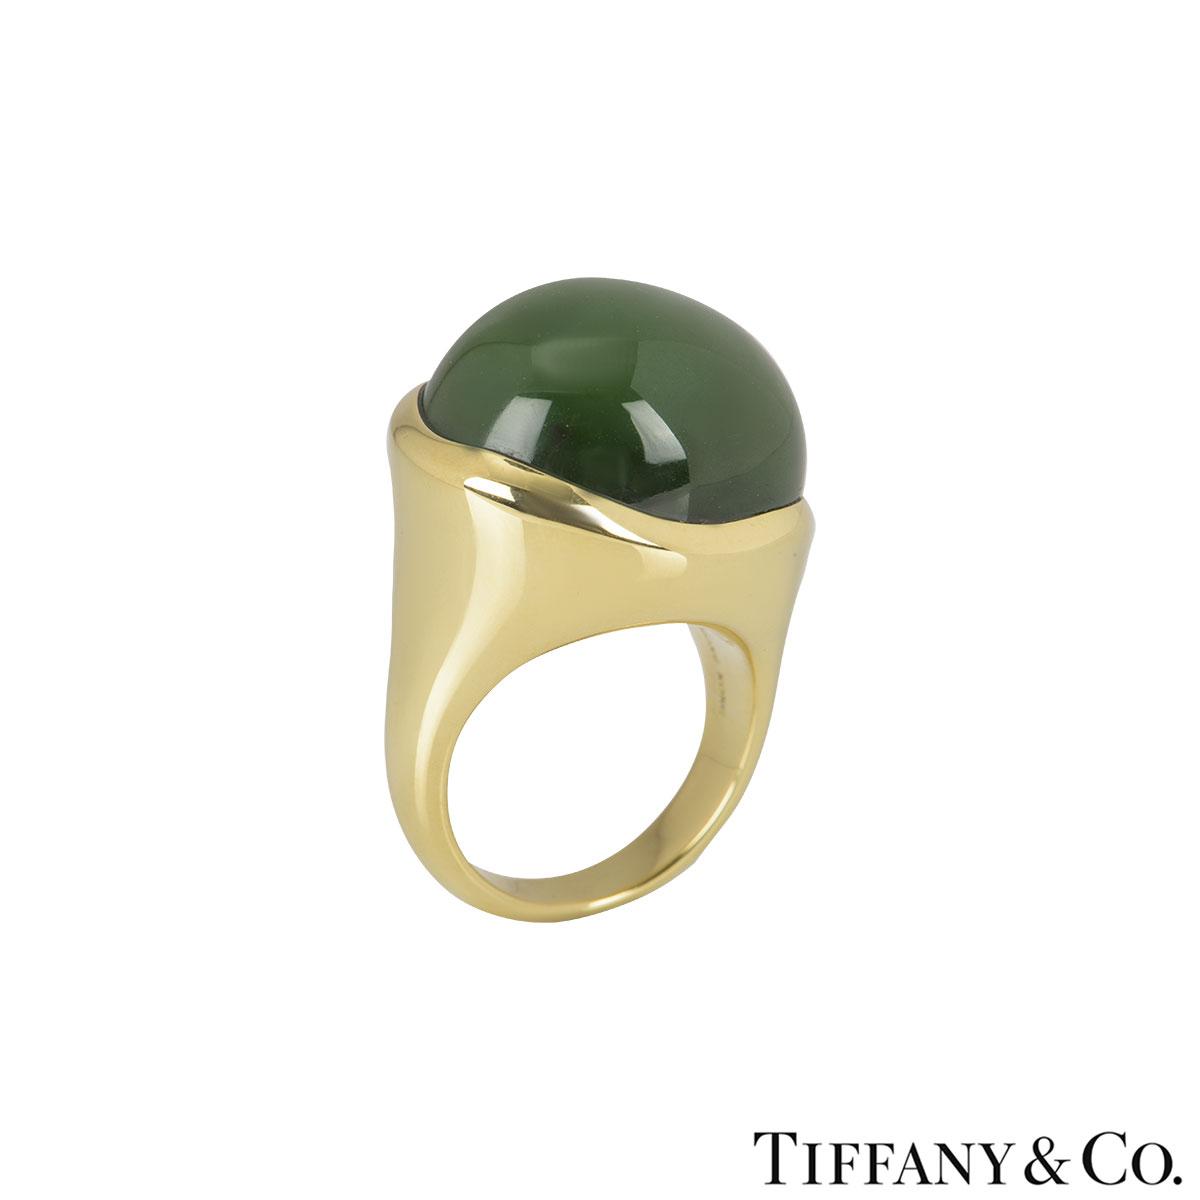 Tiffany & Co. Yellow Gold Jade Elsa Peretti Ring